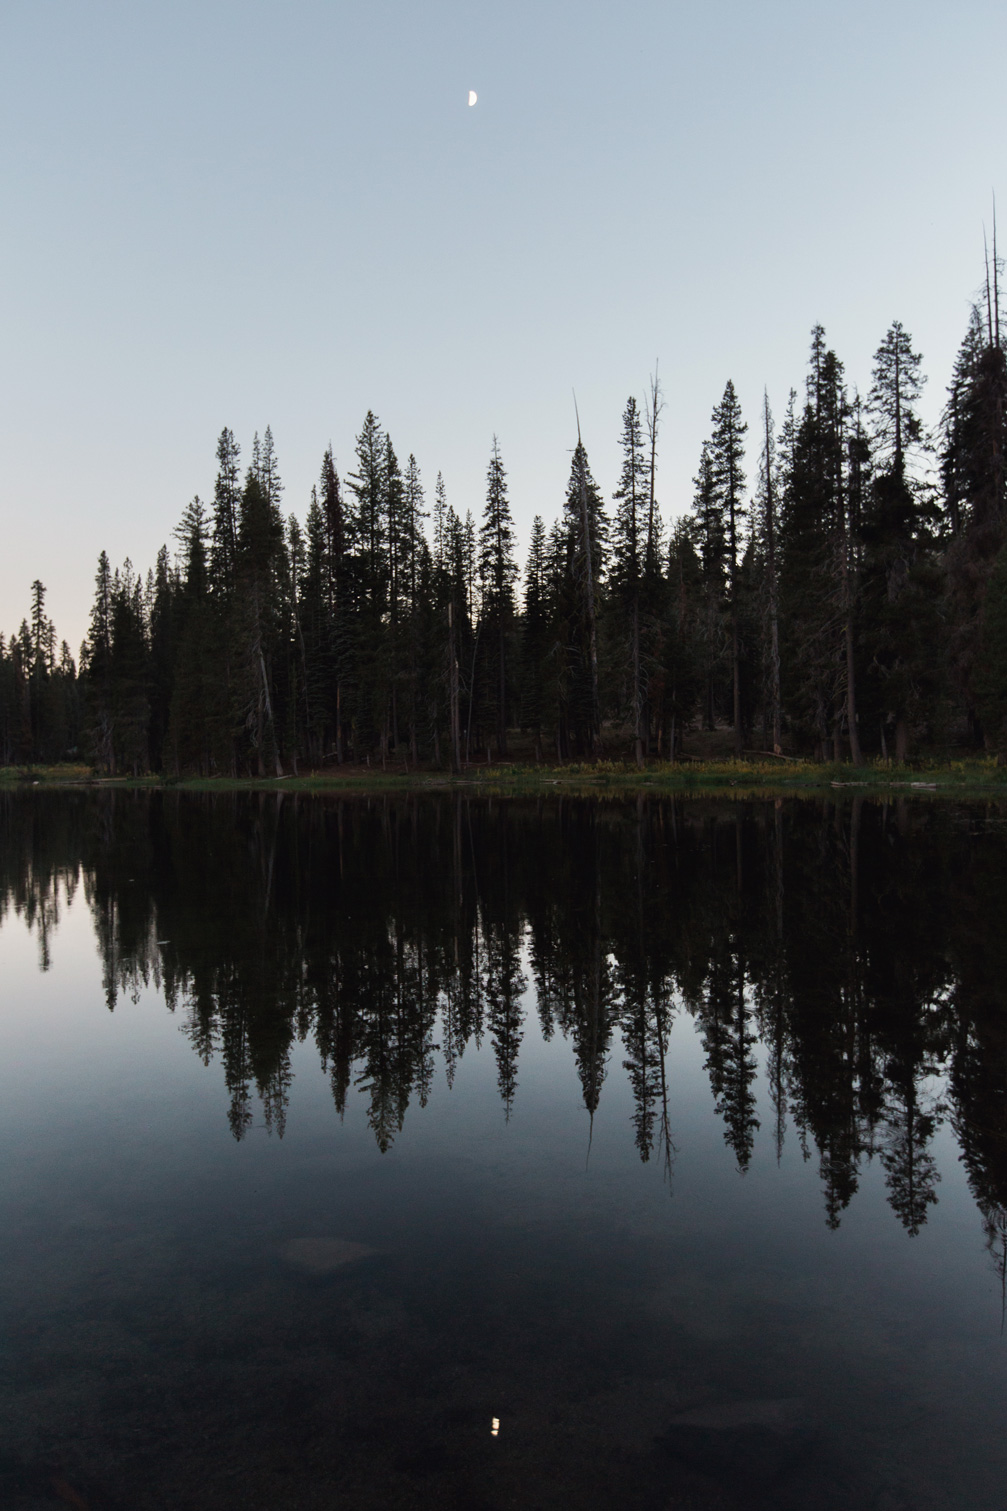 CindyGiovagnoli_Lassen_Volcanic_National_Park_California_camp_road_trip-027.jpg